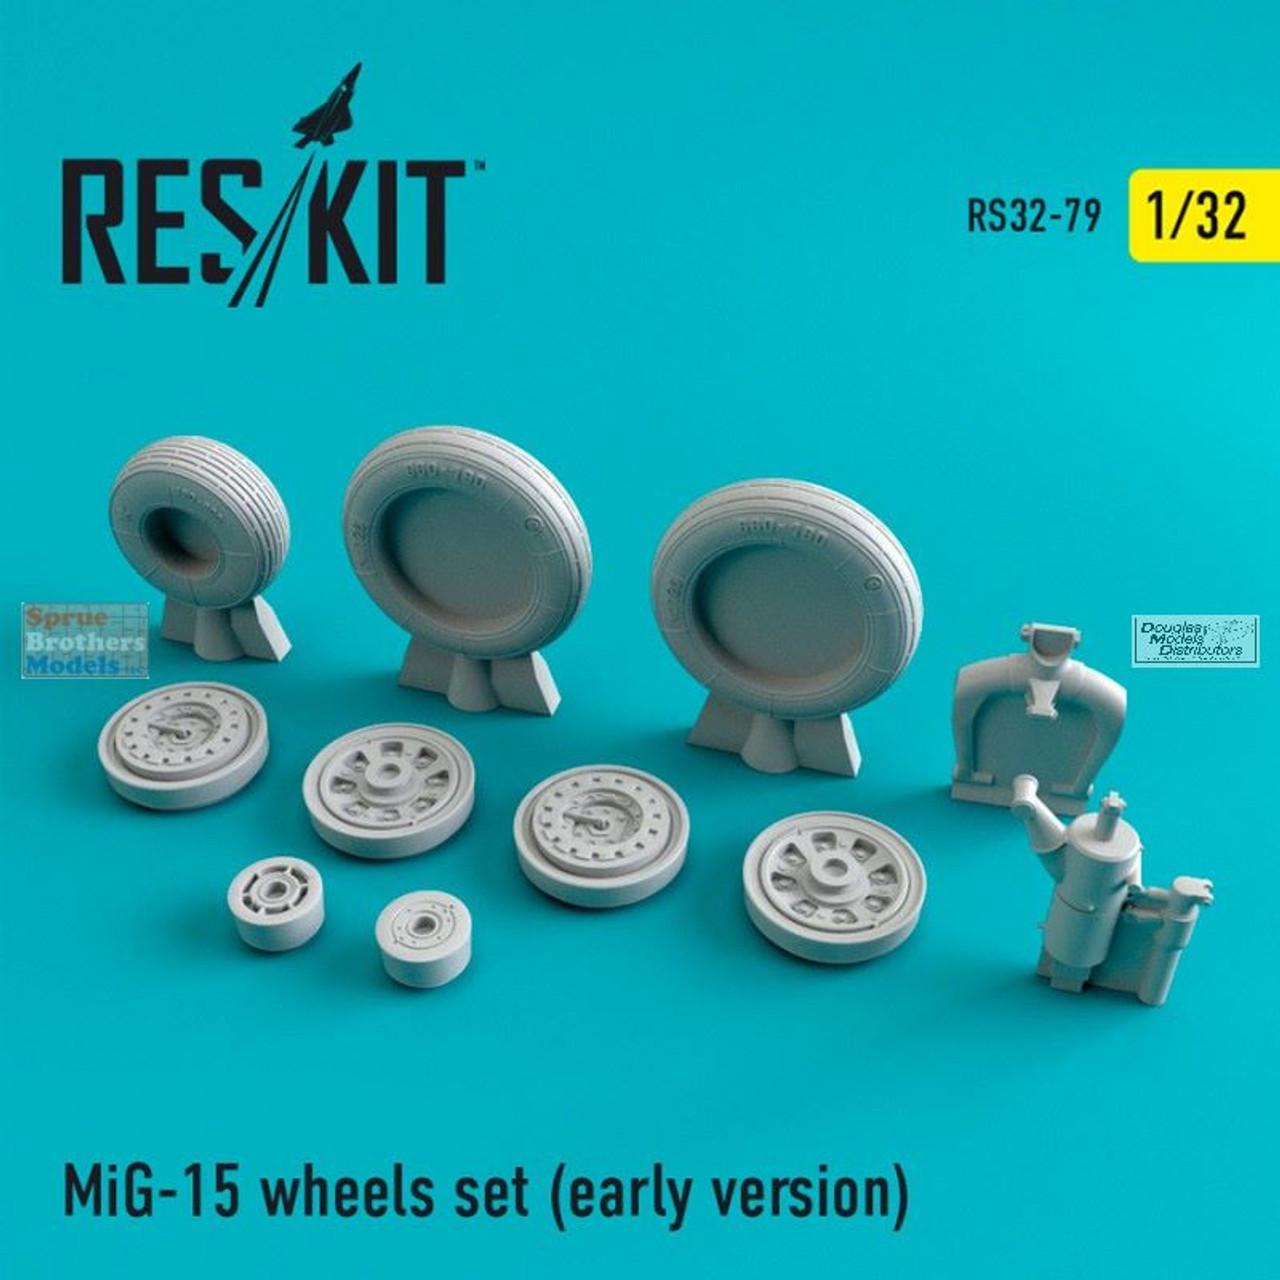 RESRS320079 1:32 ResKit MiG-15 Fagot Early Wheels Set